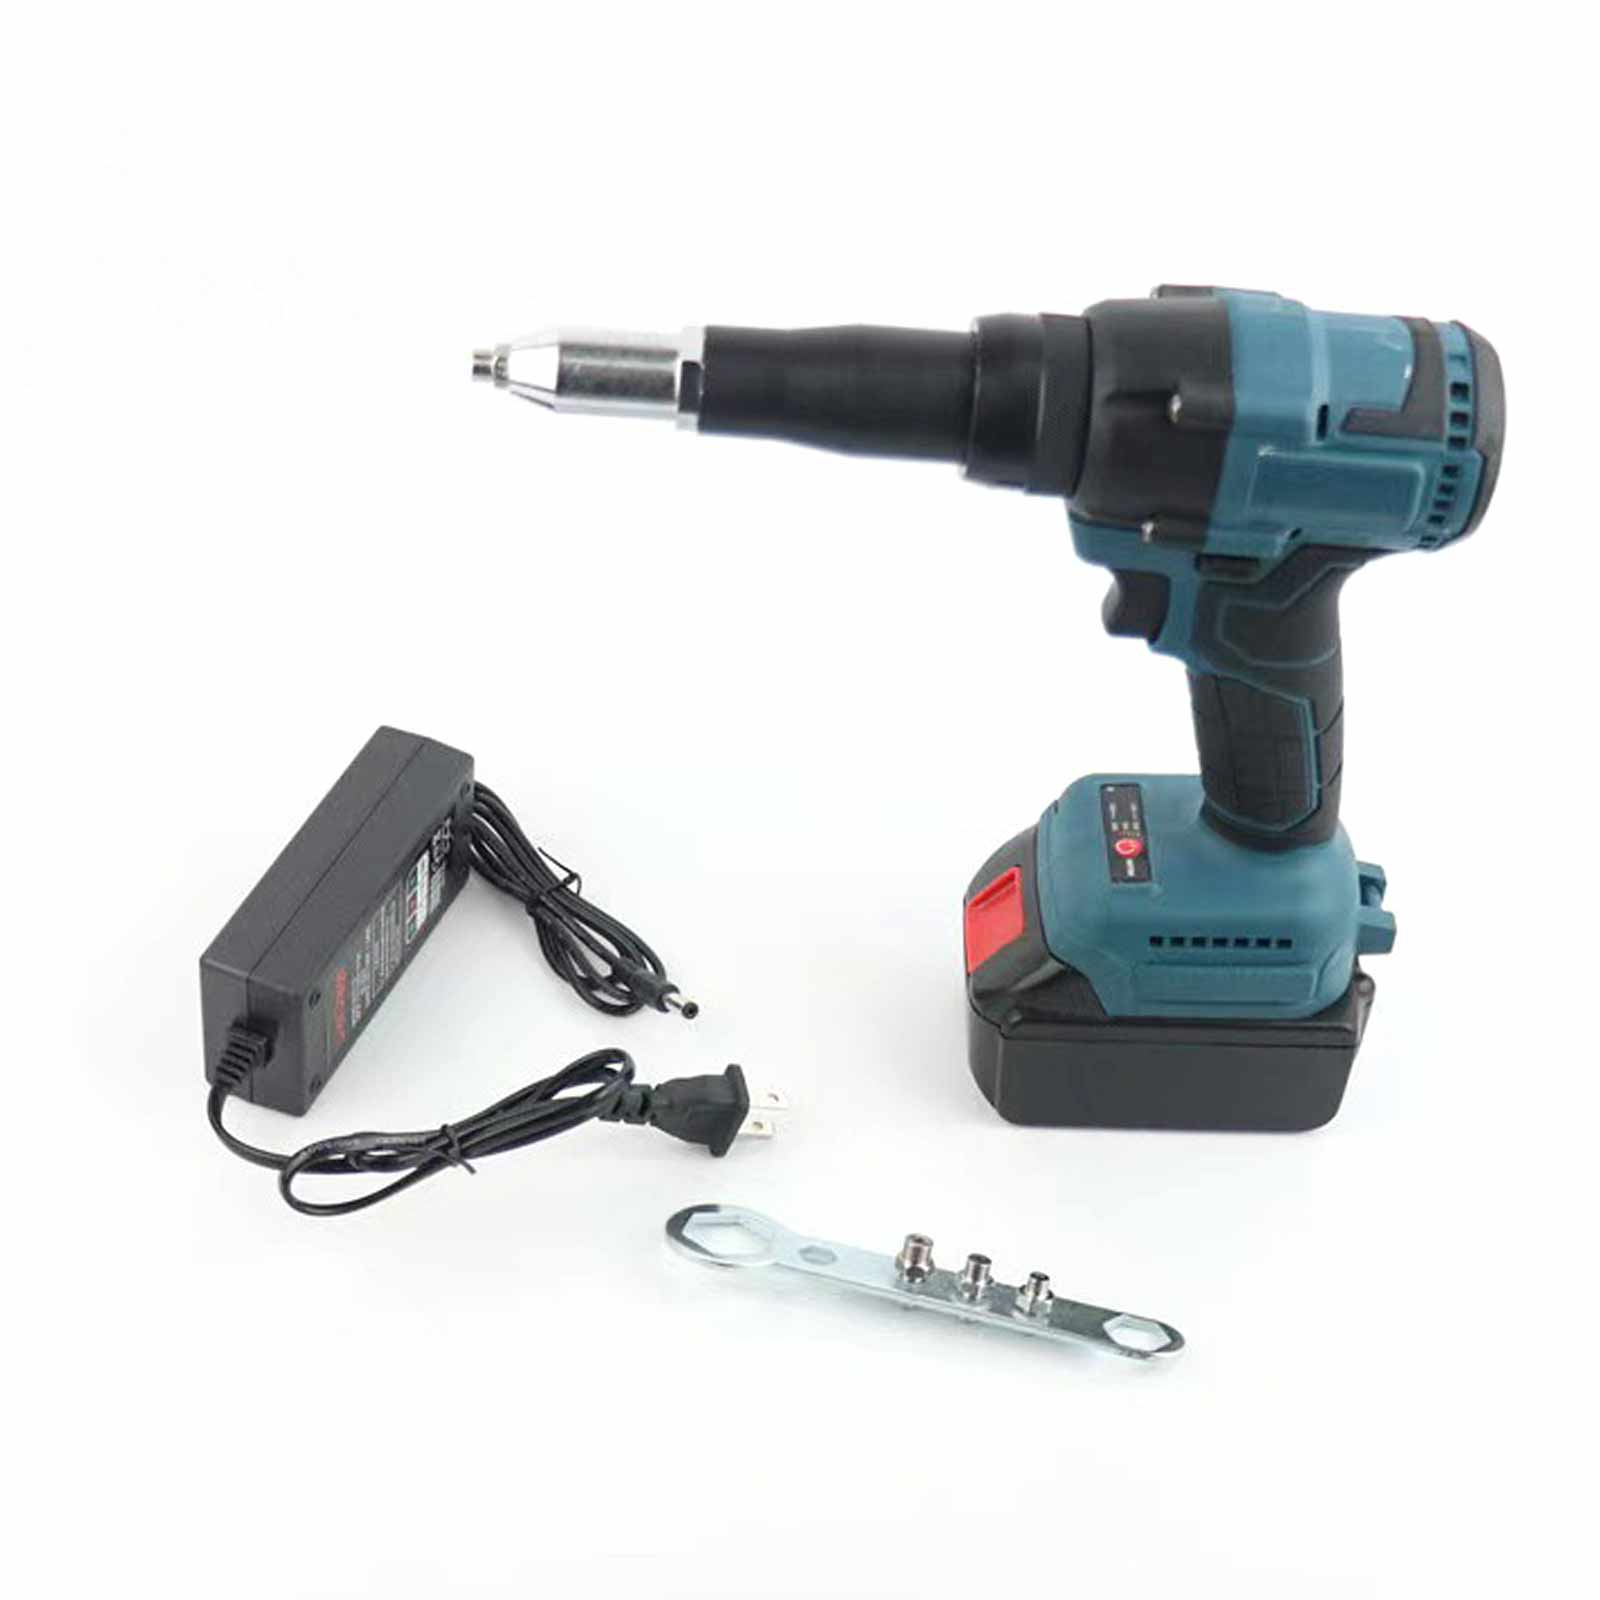 Electric Rivet Gun Cordless Rivet Nut Gun Drill Insert Nut Pull Riveting Tool 3.2/4.8/5.2mmWith LED Light For Makita 21V Battery